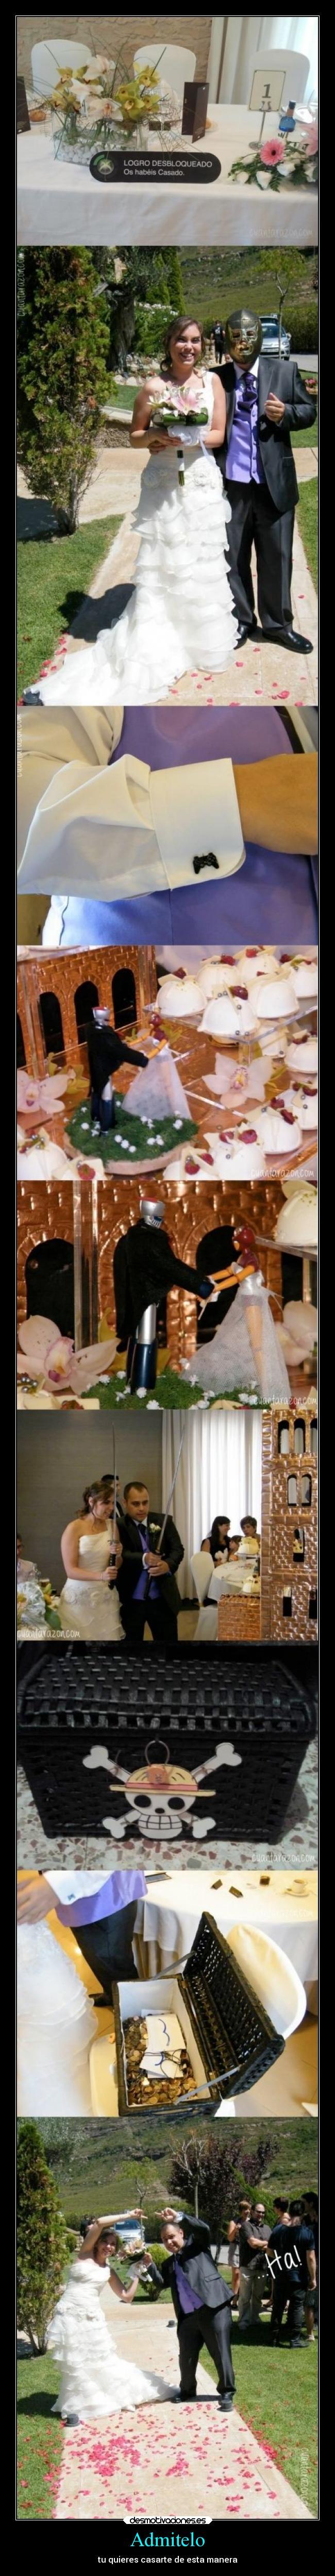 carteles anime boda frikis otakus goku desmotivaciones